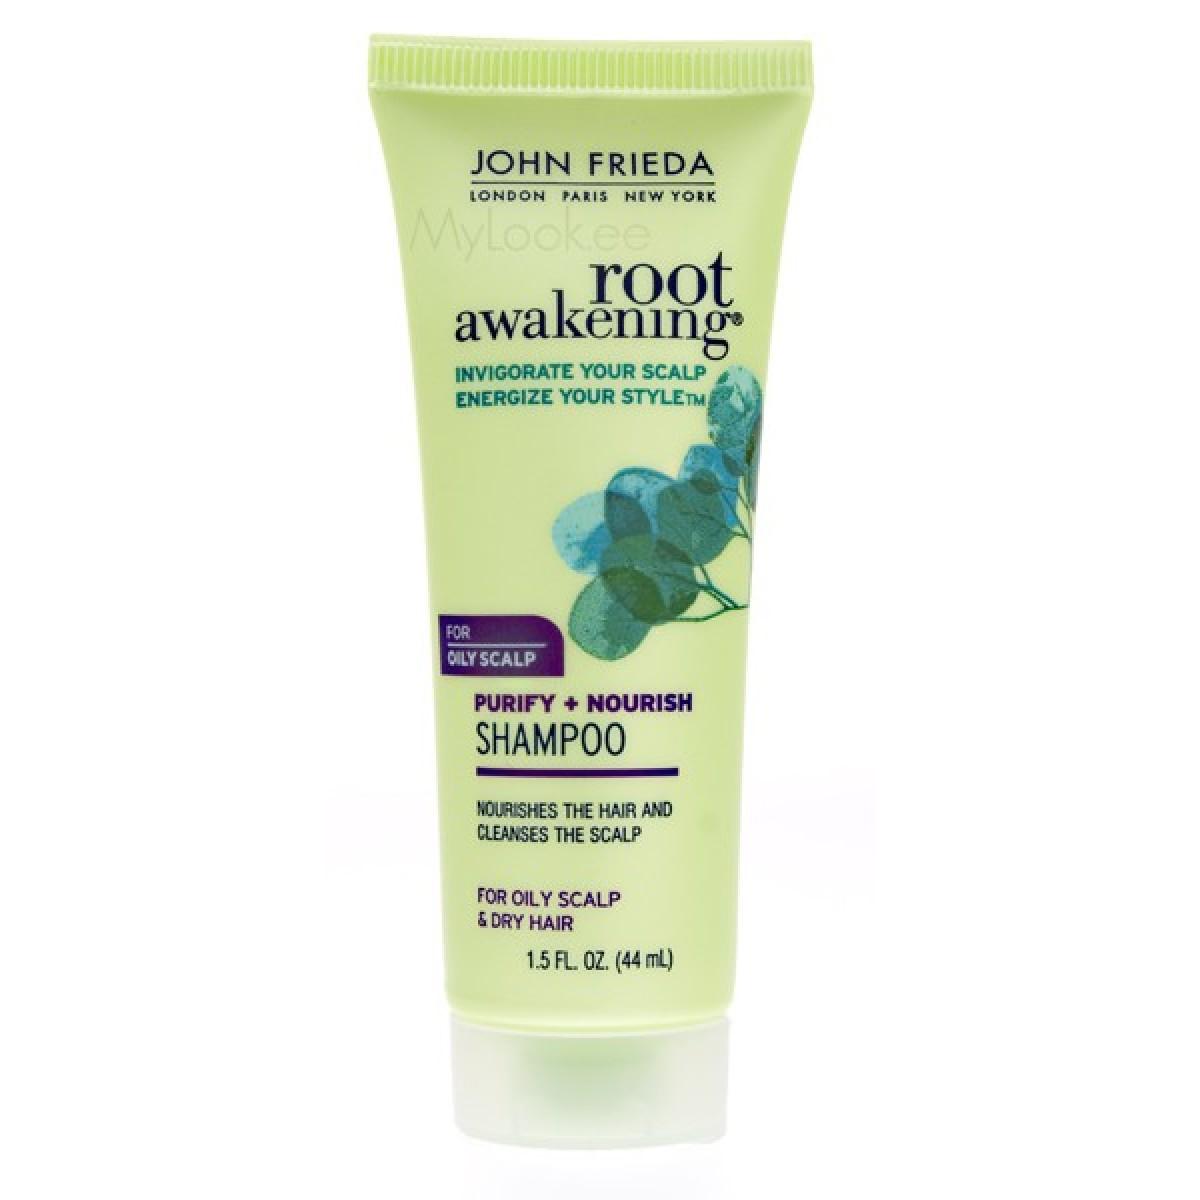 john_frieda_root_awekening_purify_nourish_shampoo_44ml_